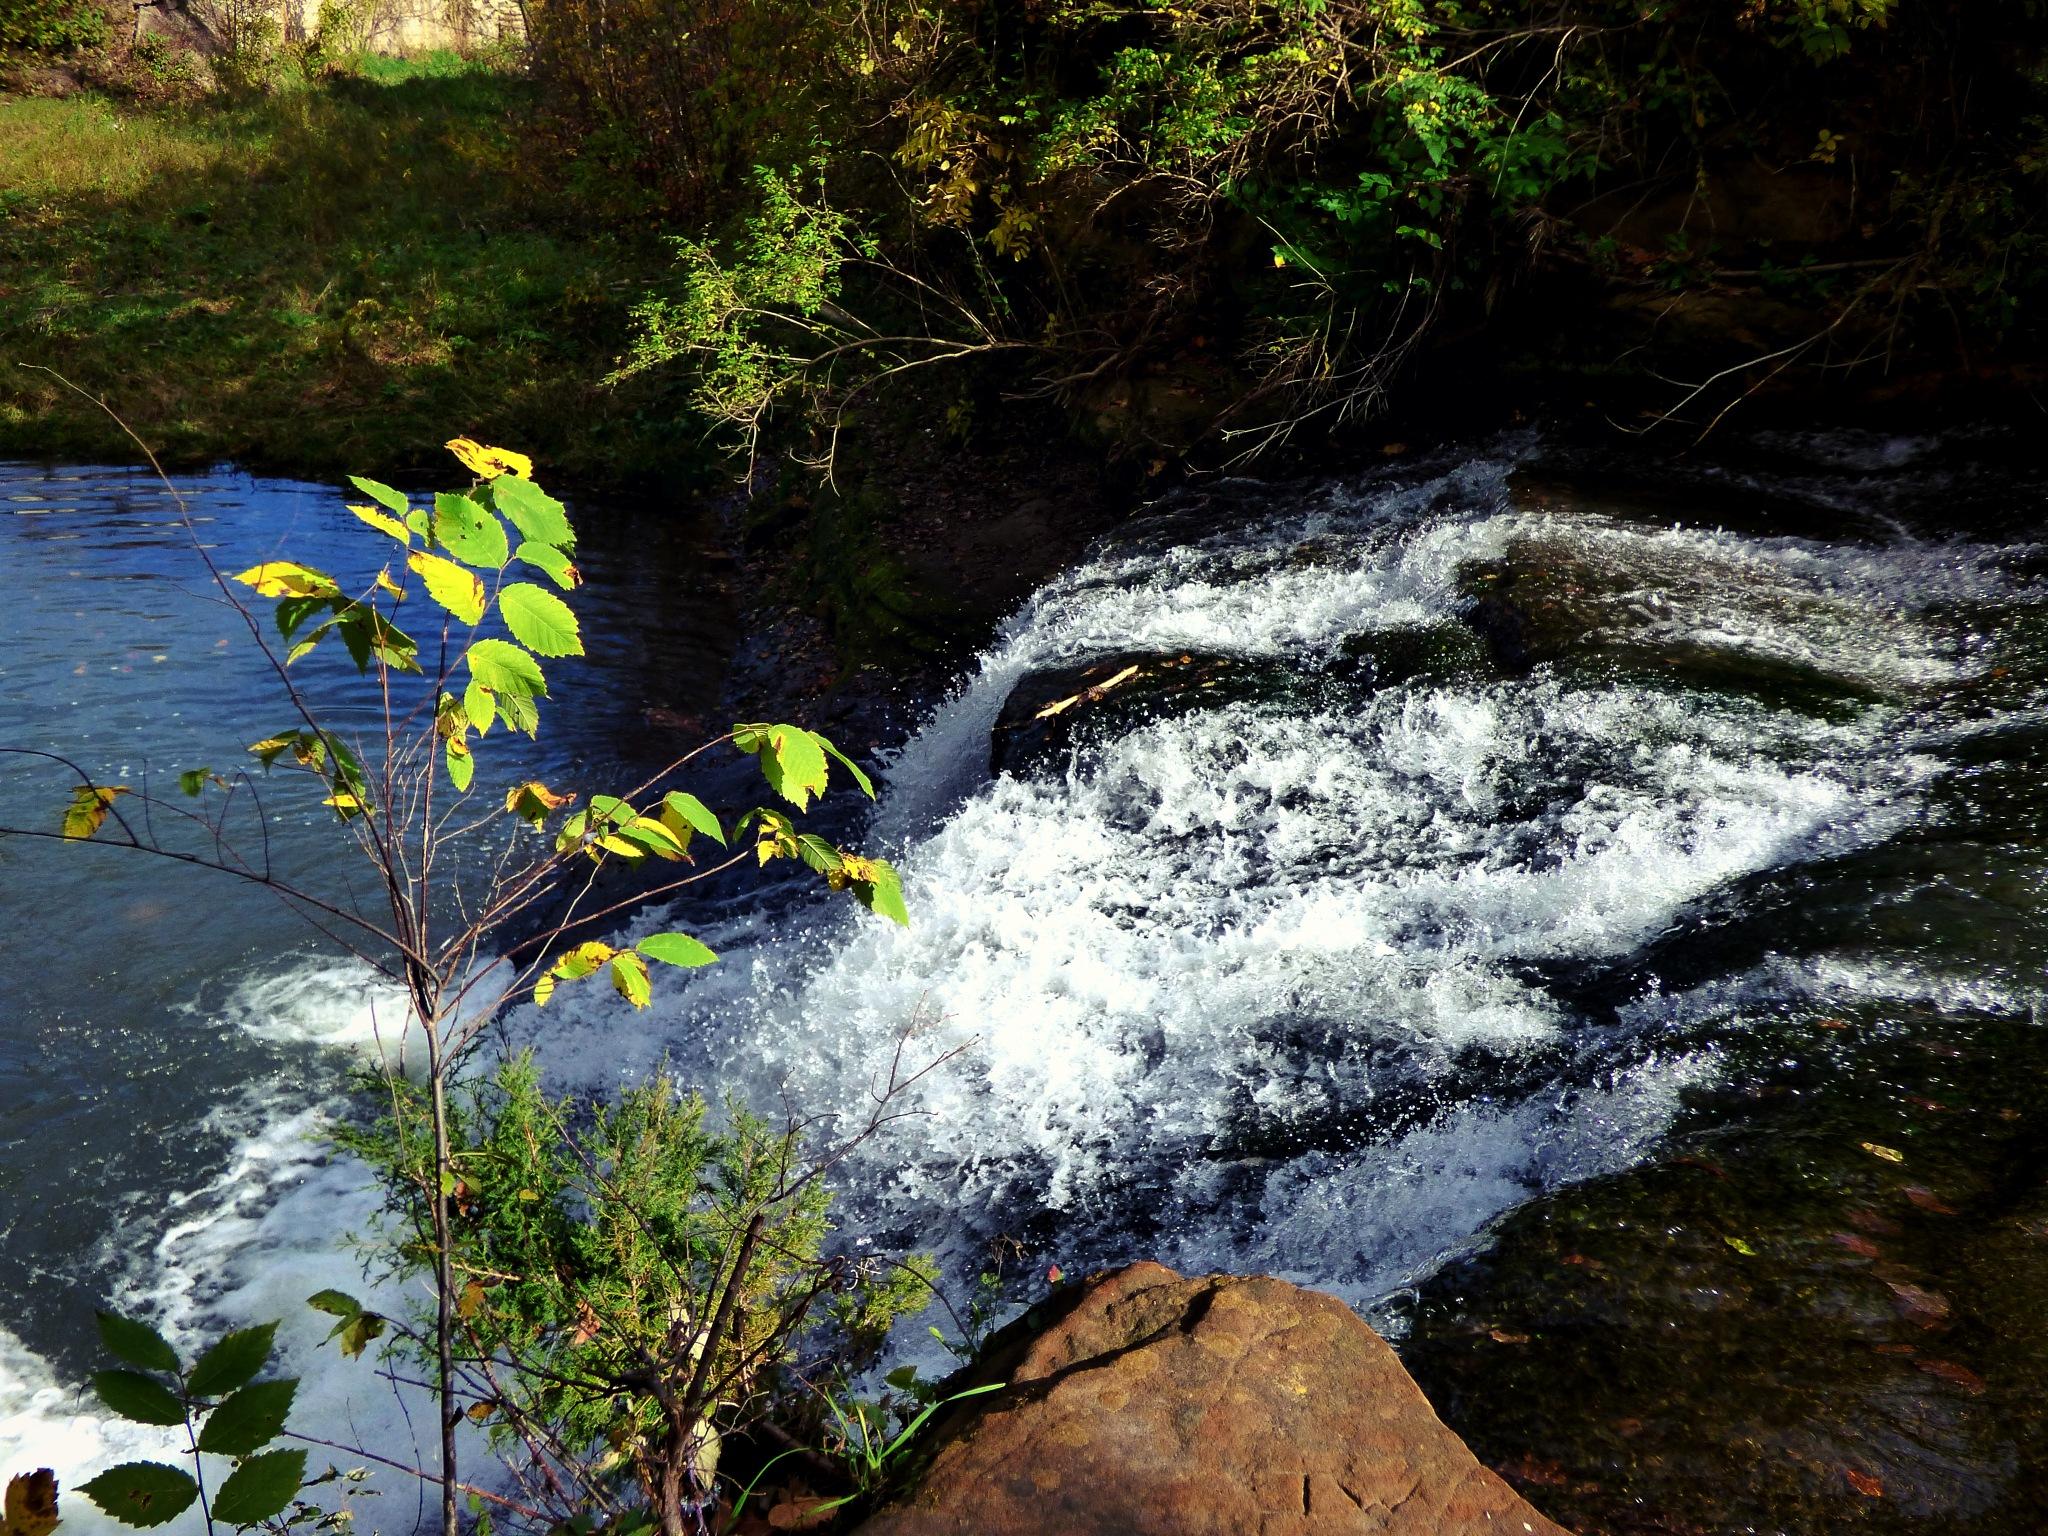 Mini Rapids by smjacob